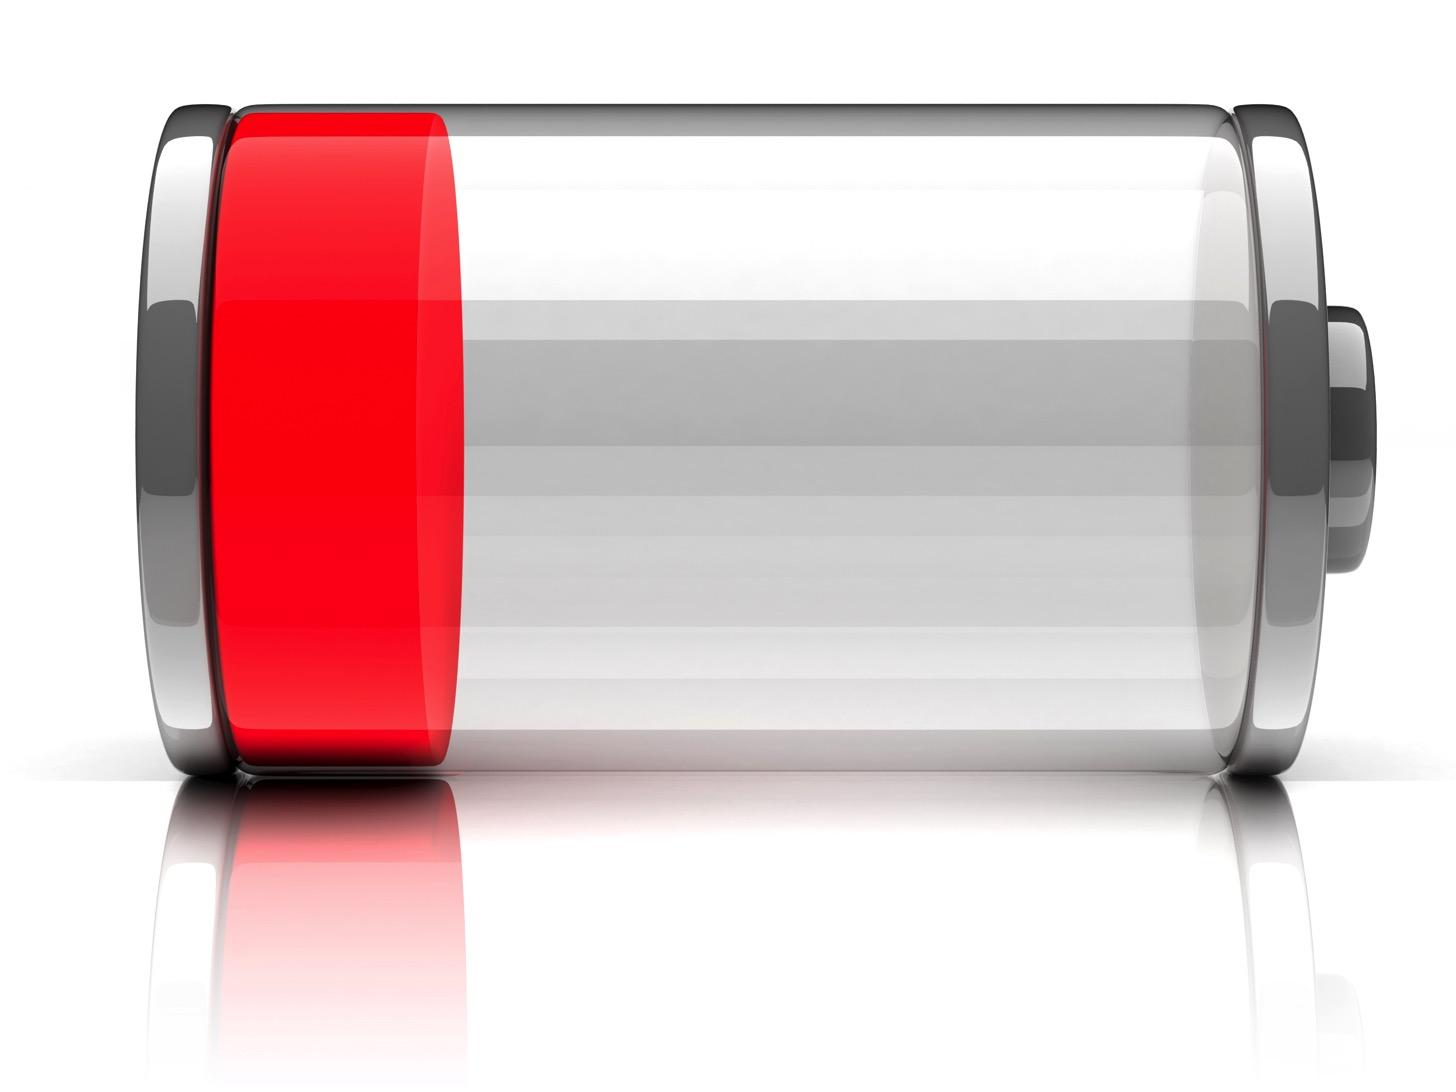 iPhoneのバッテリーが残り1%…。しかし帰宅まで音楽を聞いてたい!→ 大丈夫!アレすれば結構持つぞ!